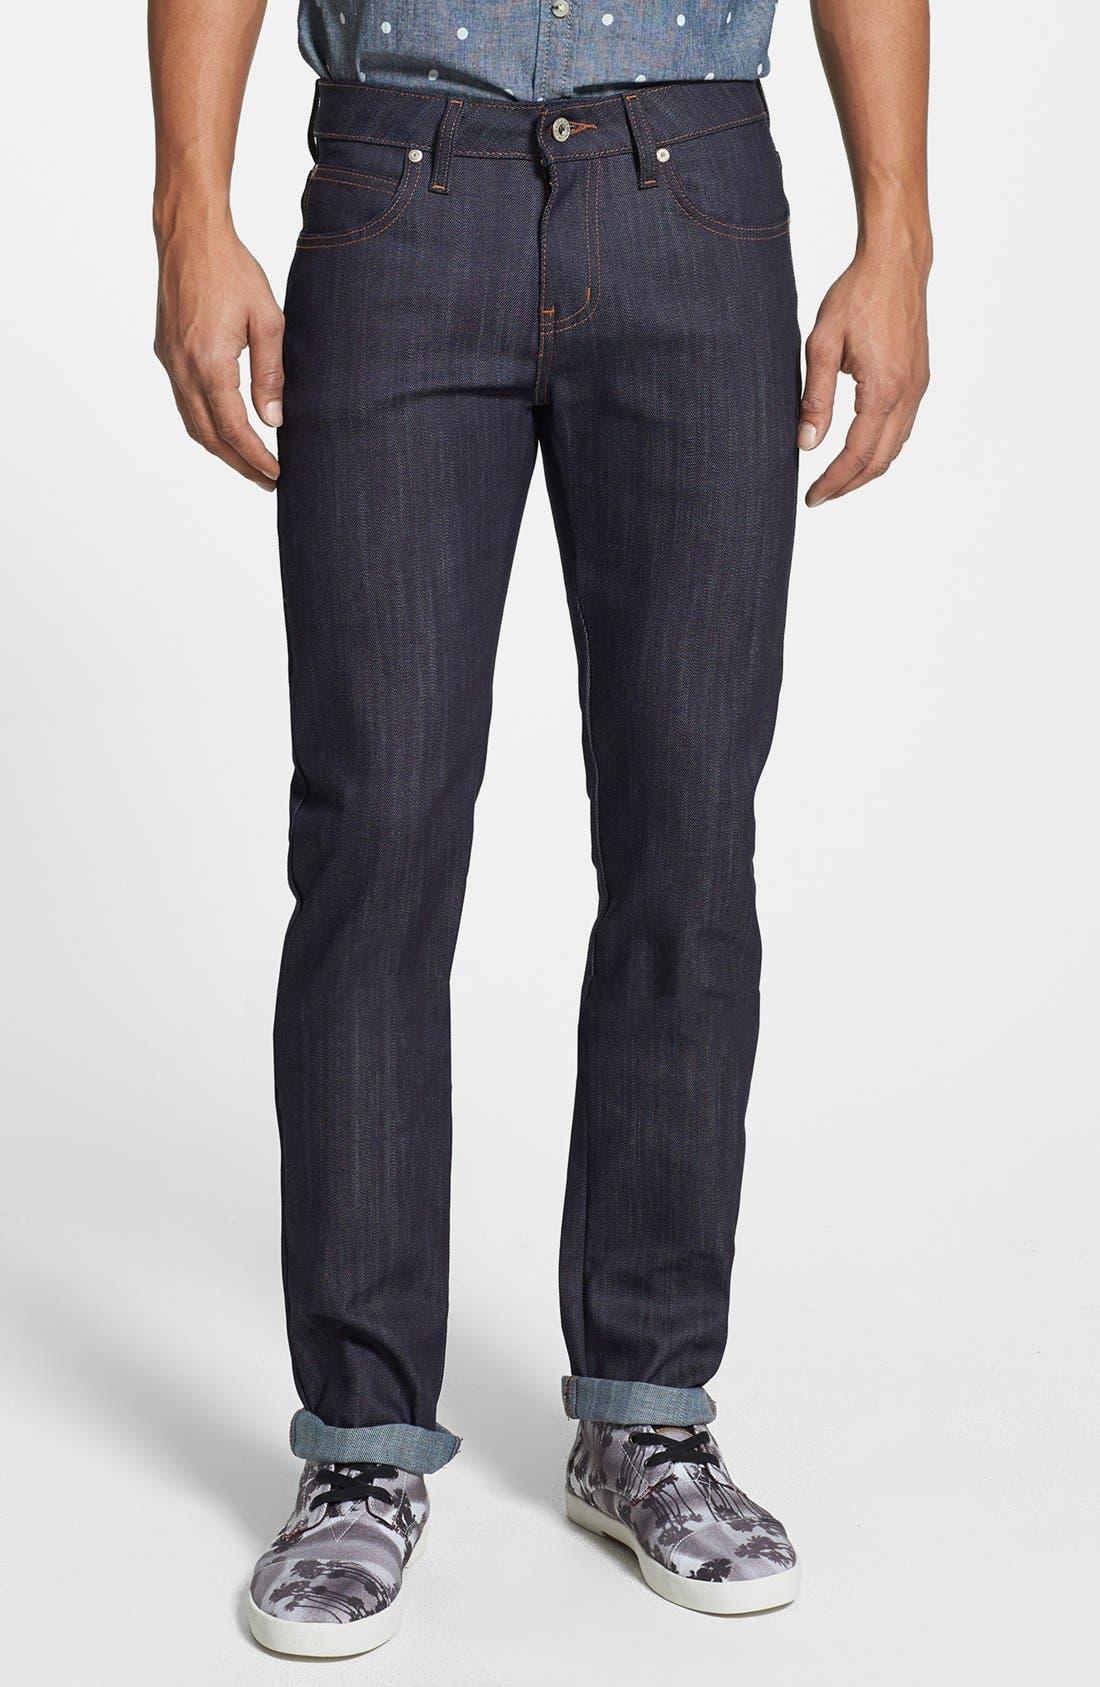 'Skinny Guy' Skinny Fit Jeans,                             Main thumbnail 1, color,                             401